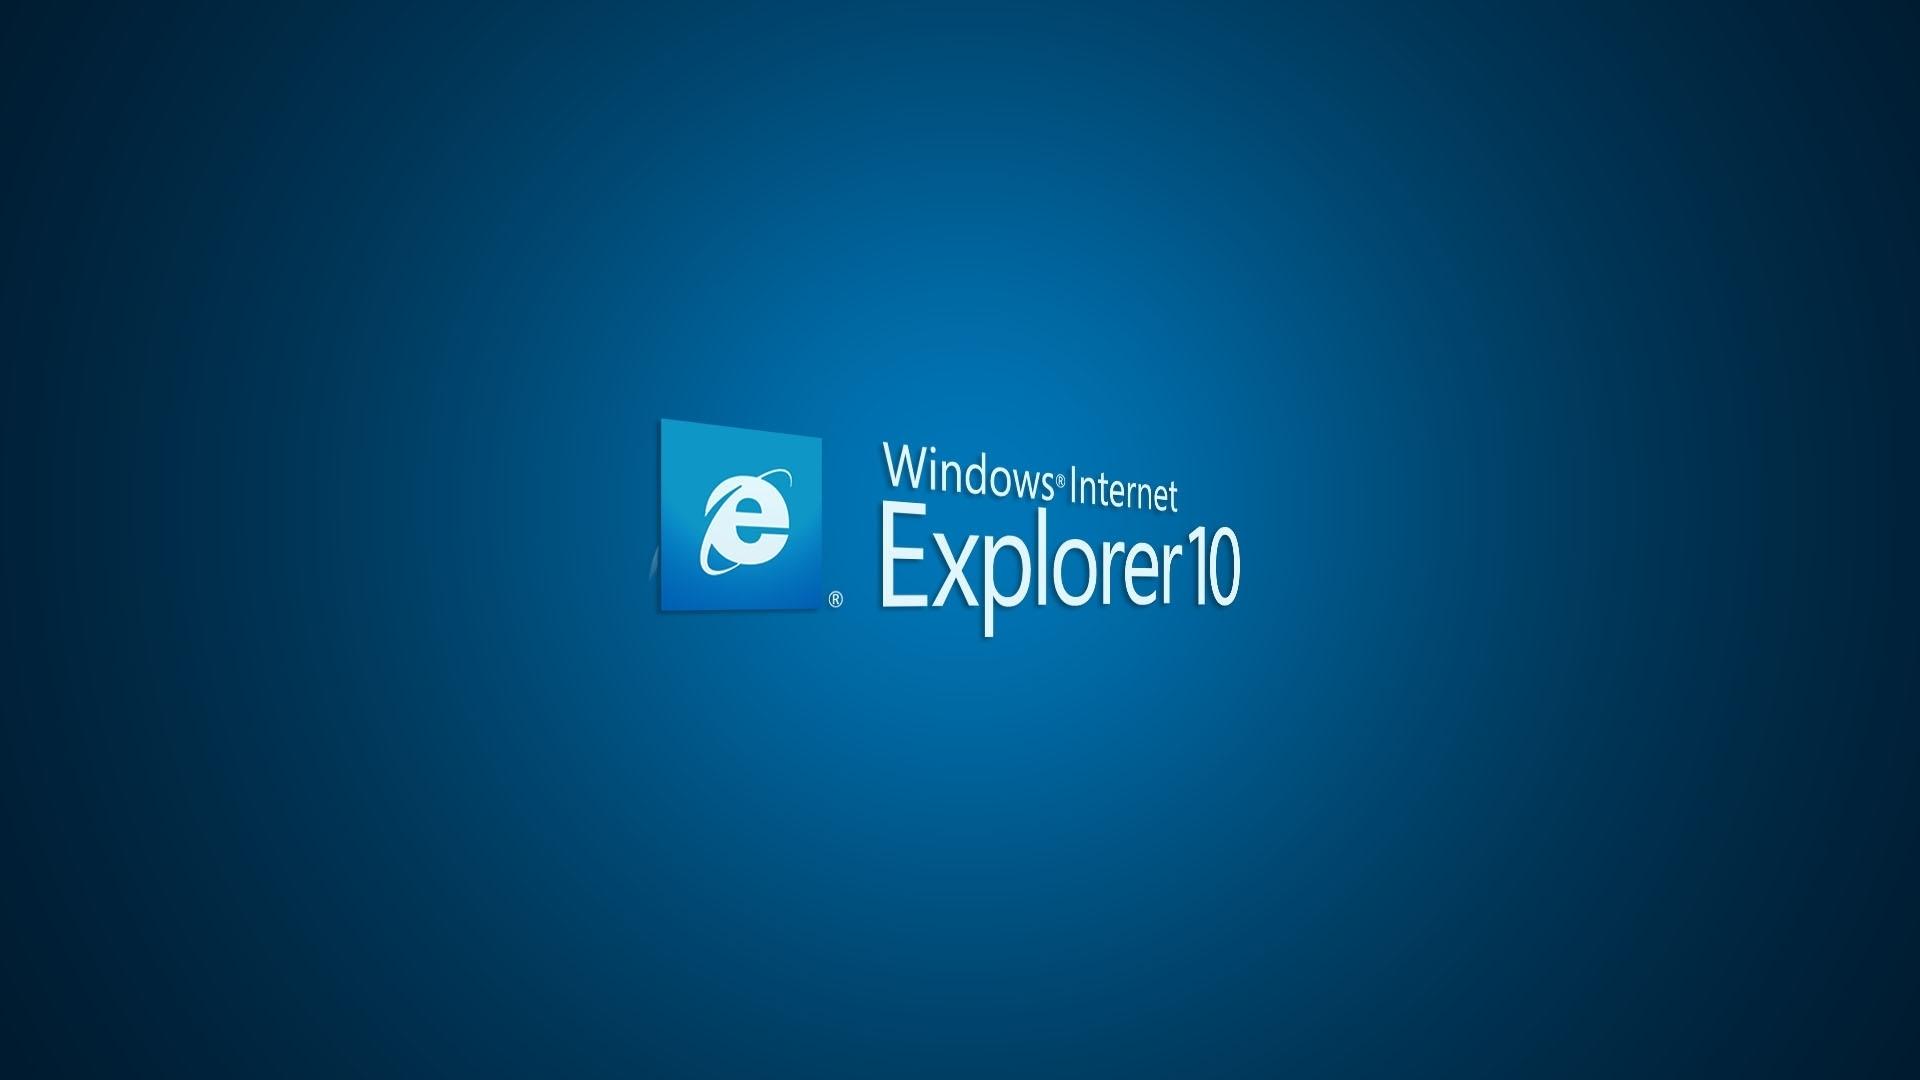 blogspot com 2012 10 microsoft windows internet explorer 10 html 1920x1080